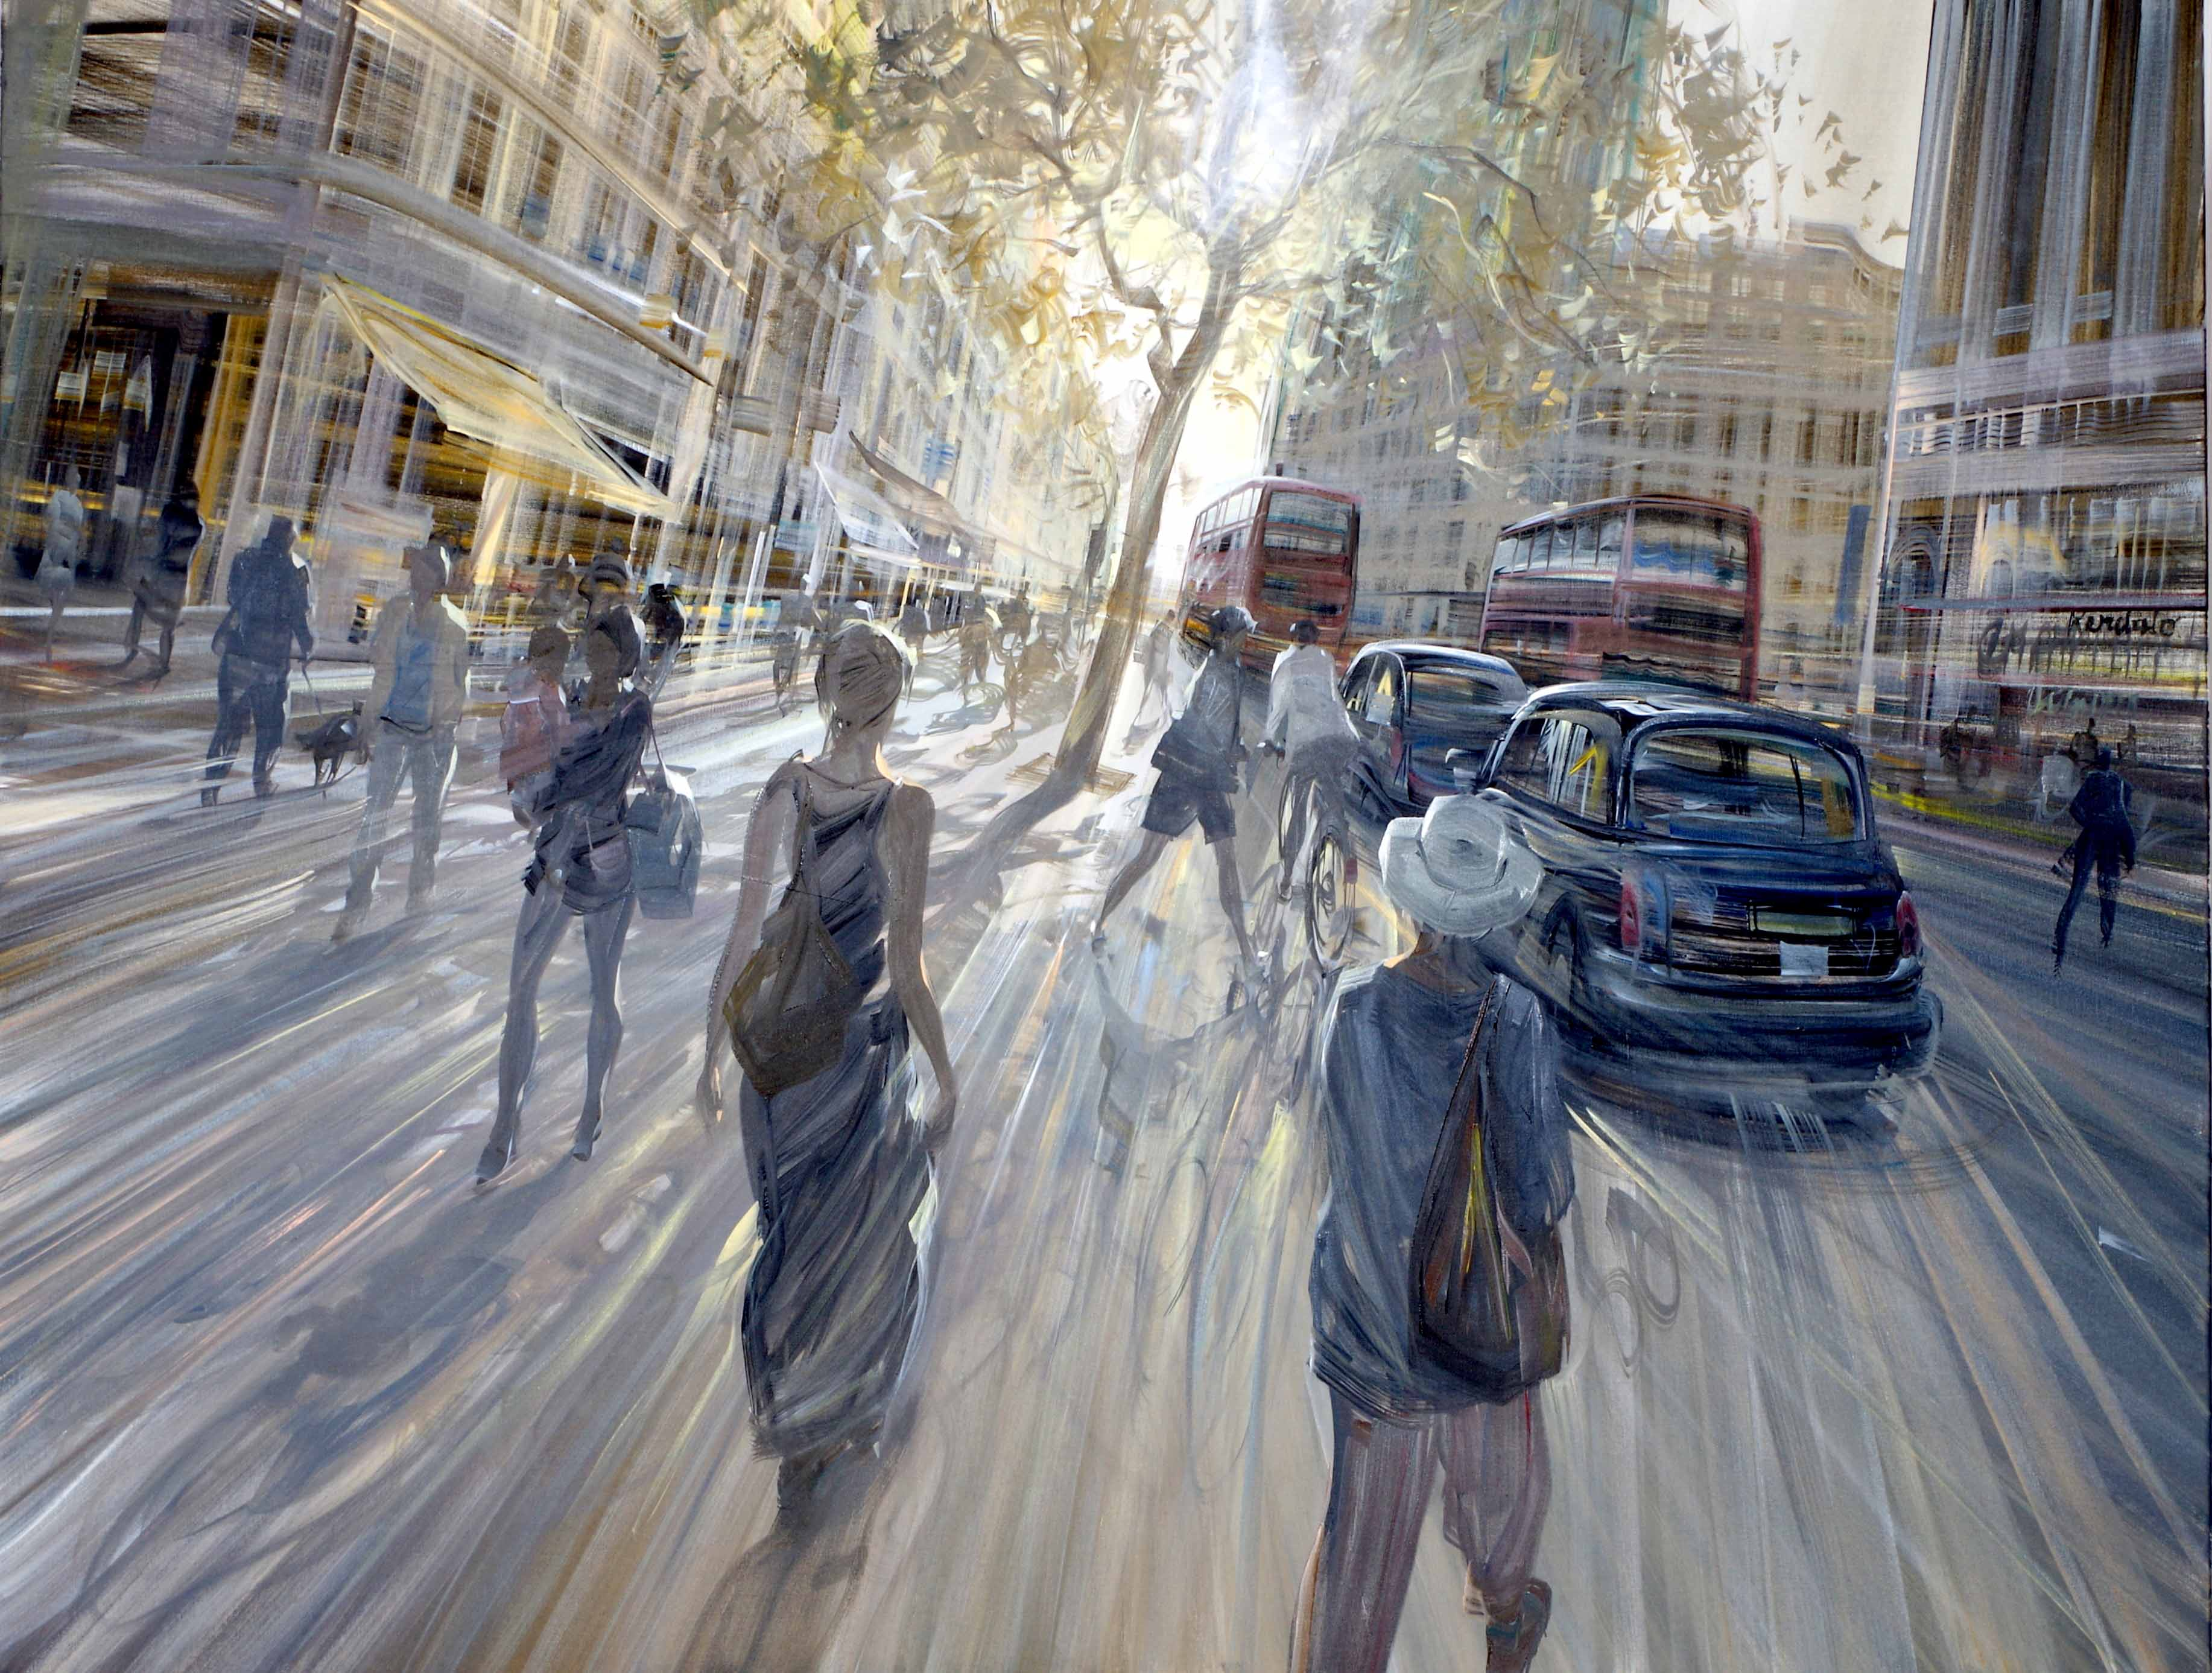 kerdalo artiste peinture oxford street londres